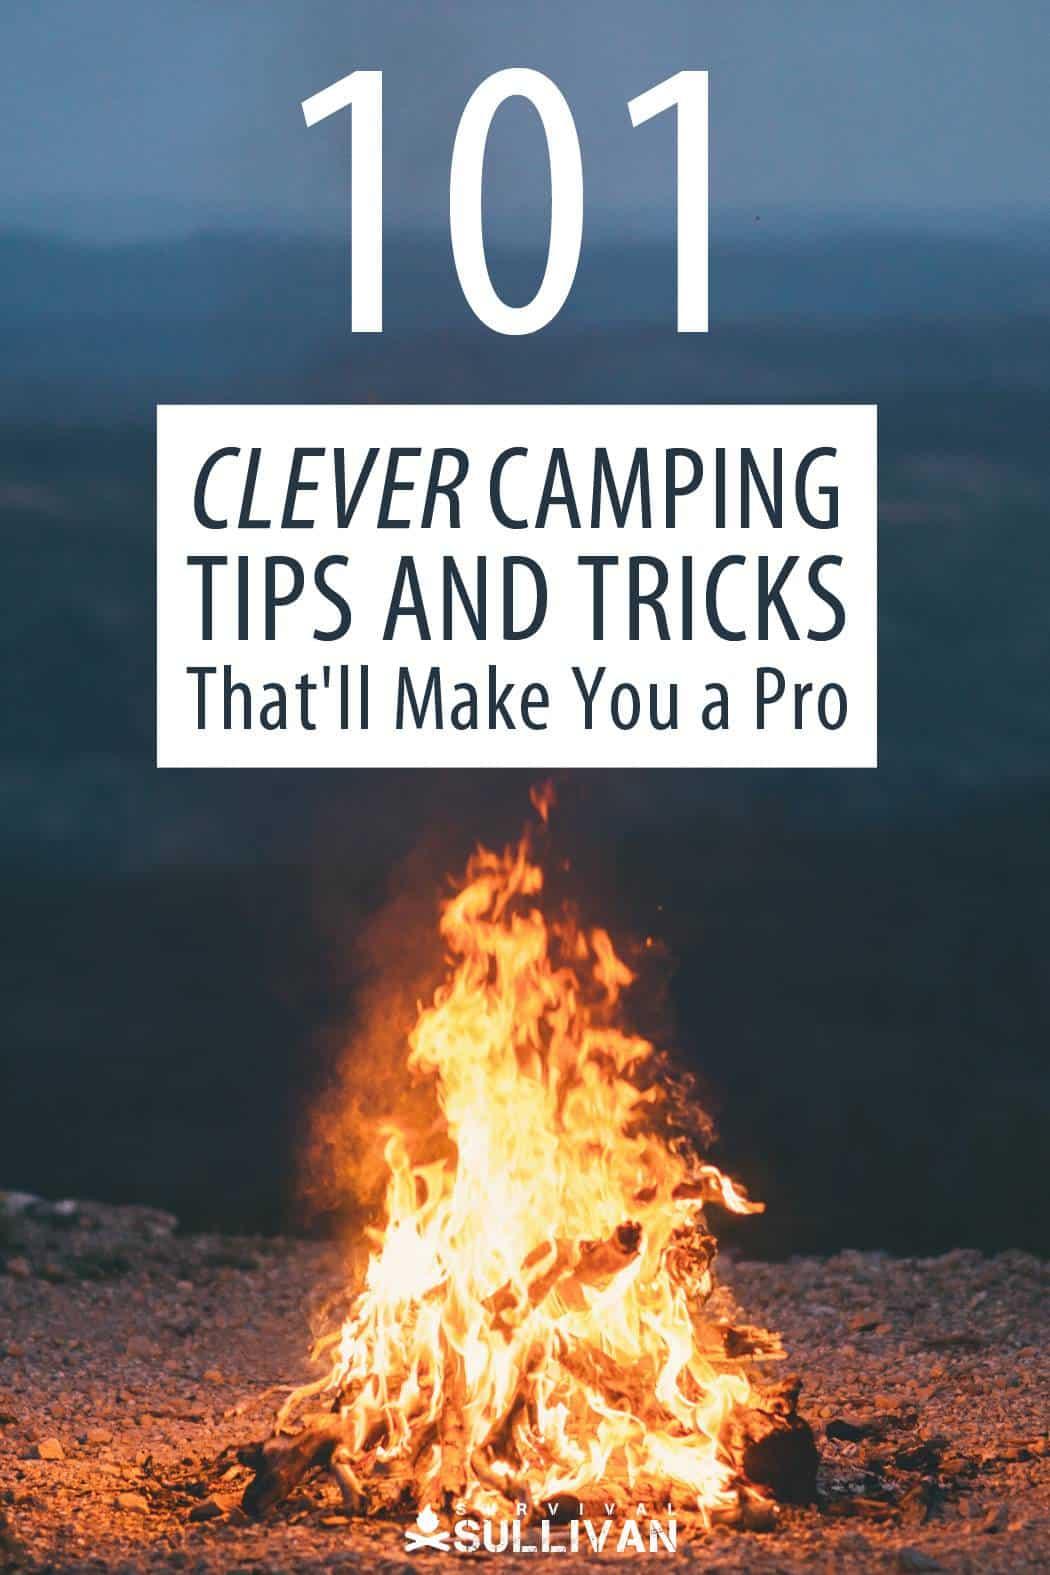 camping tips Pinterest image